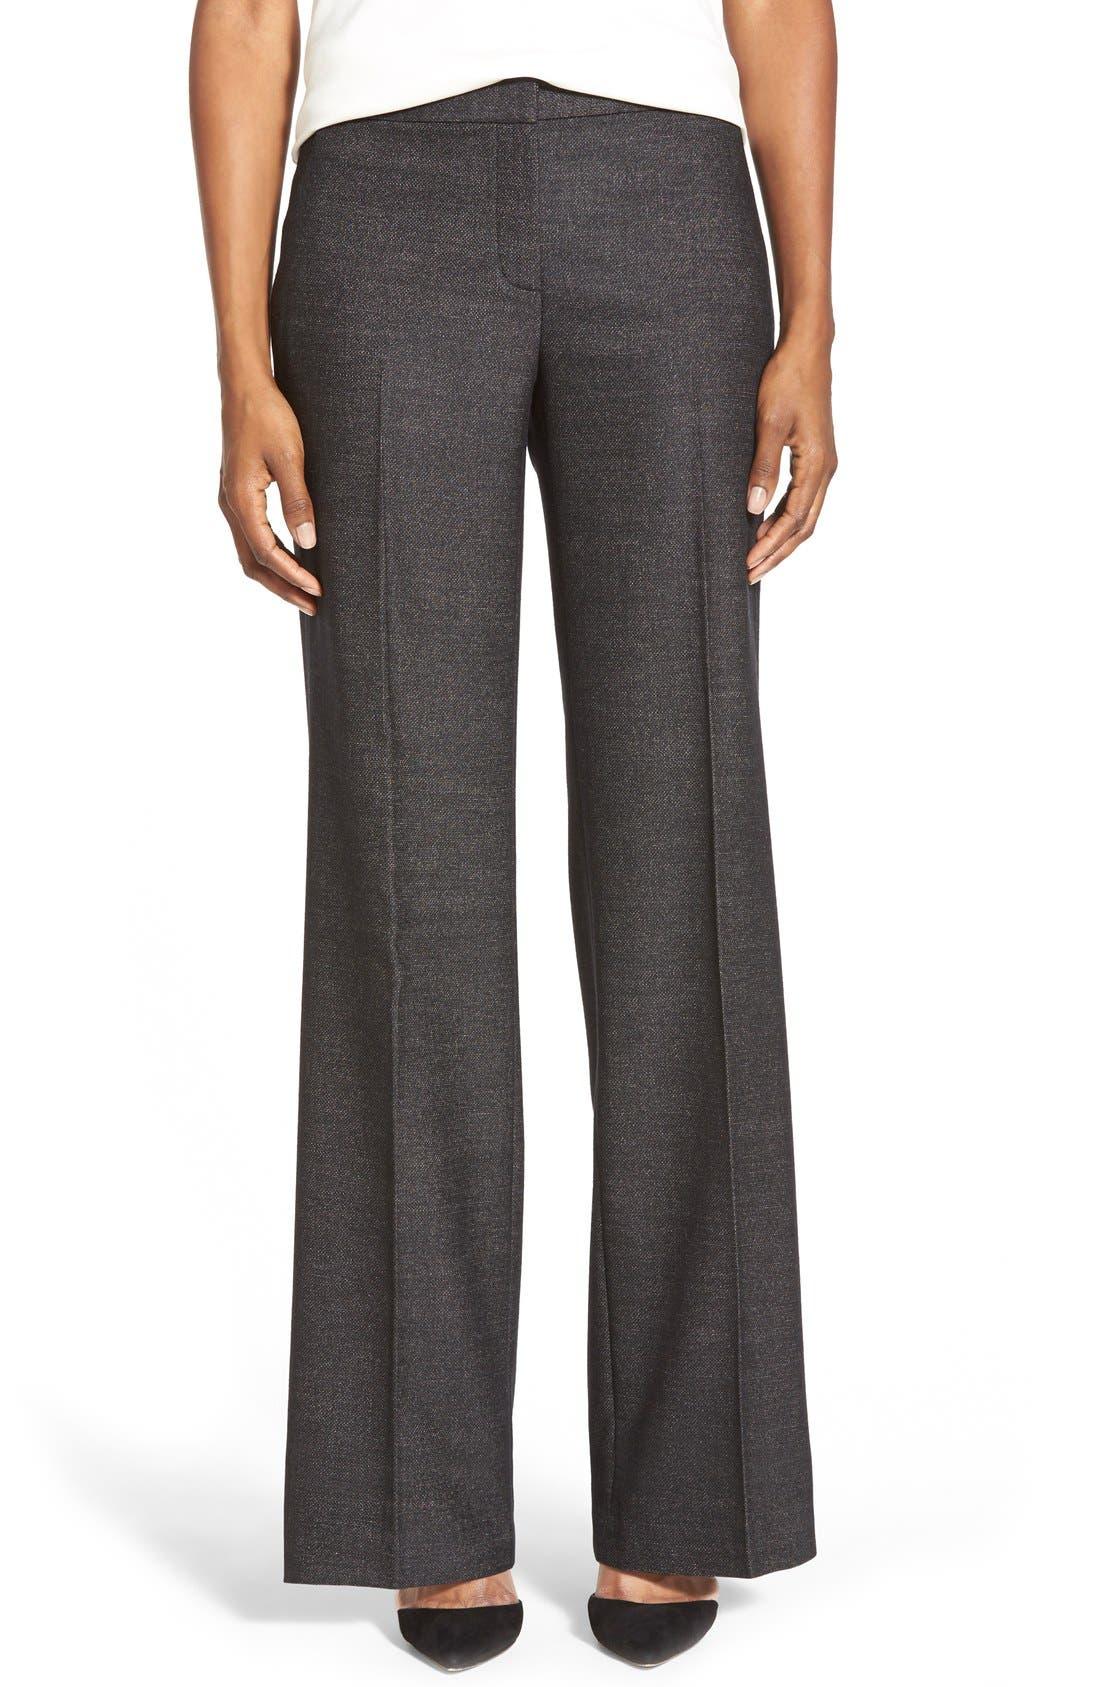 Main Image - Classiques Entier® 'Verona' Suiting Trousers (Regular & Petite)